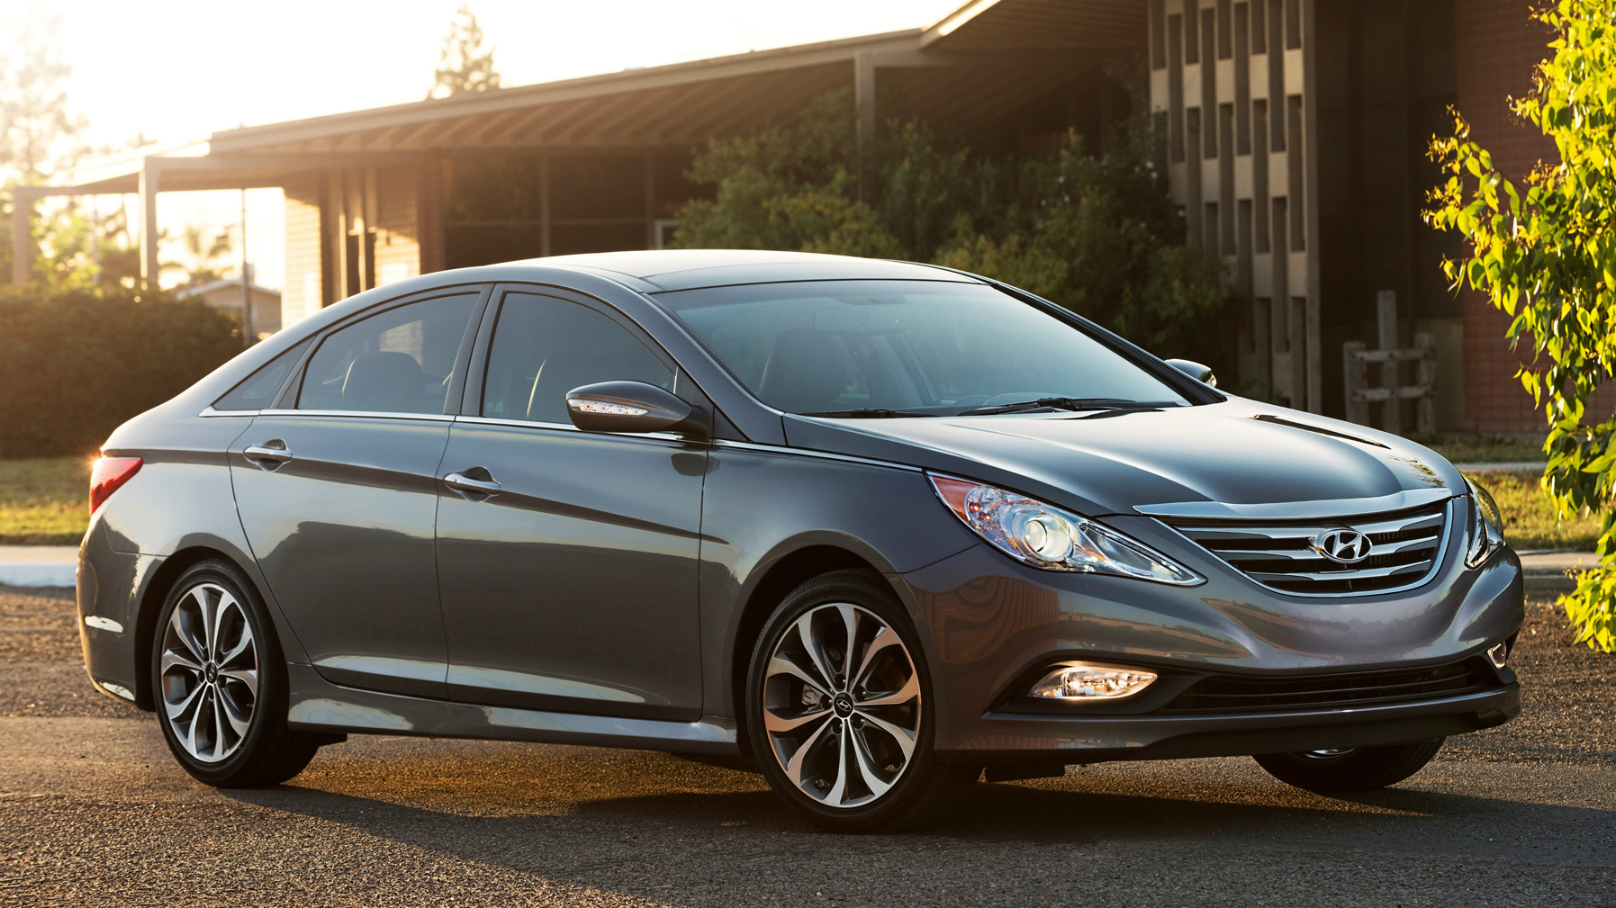 Hyundai dependability